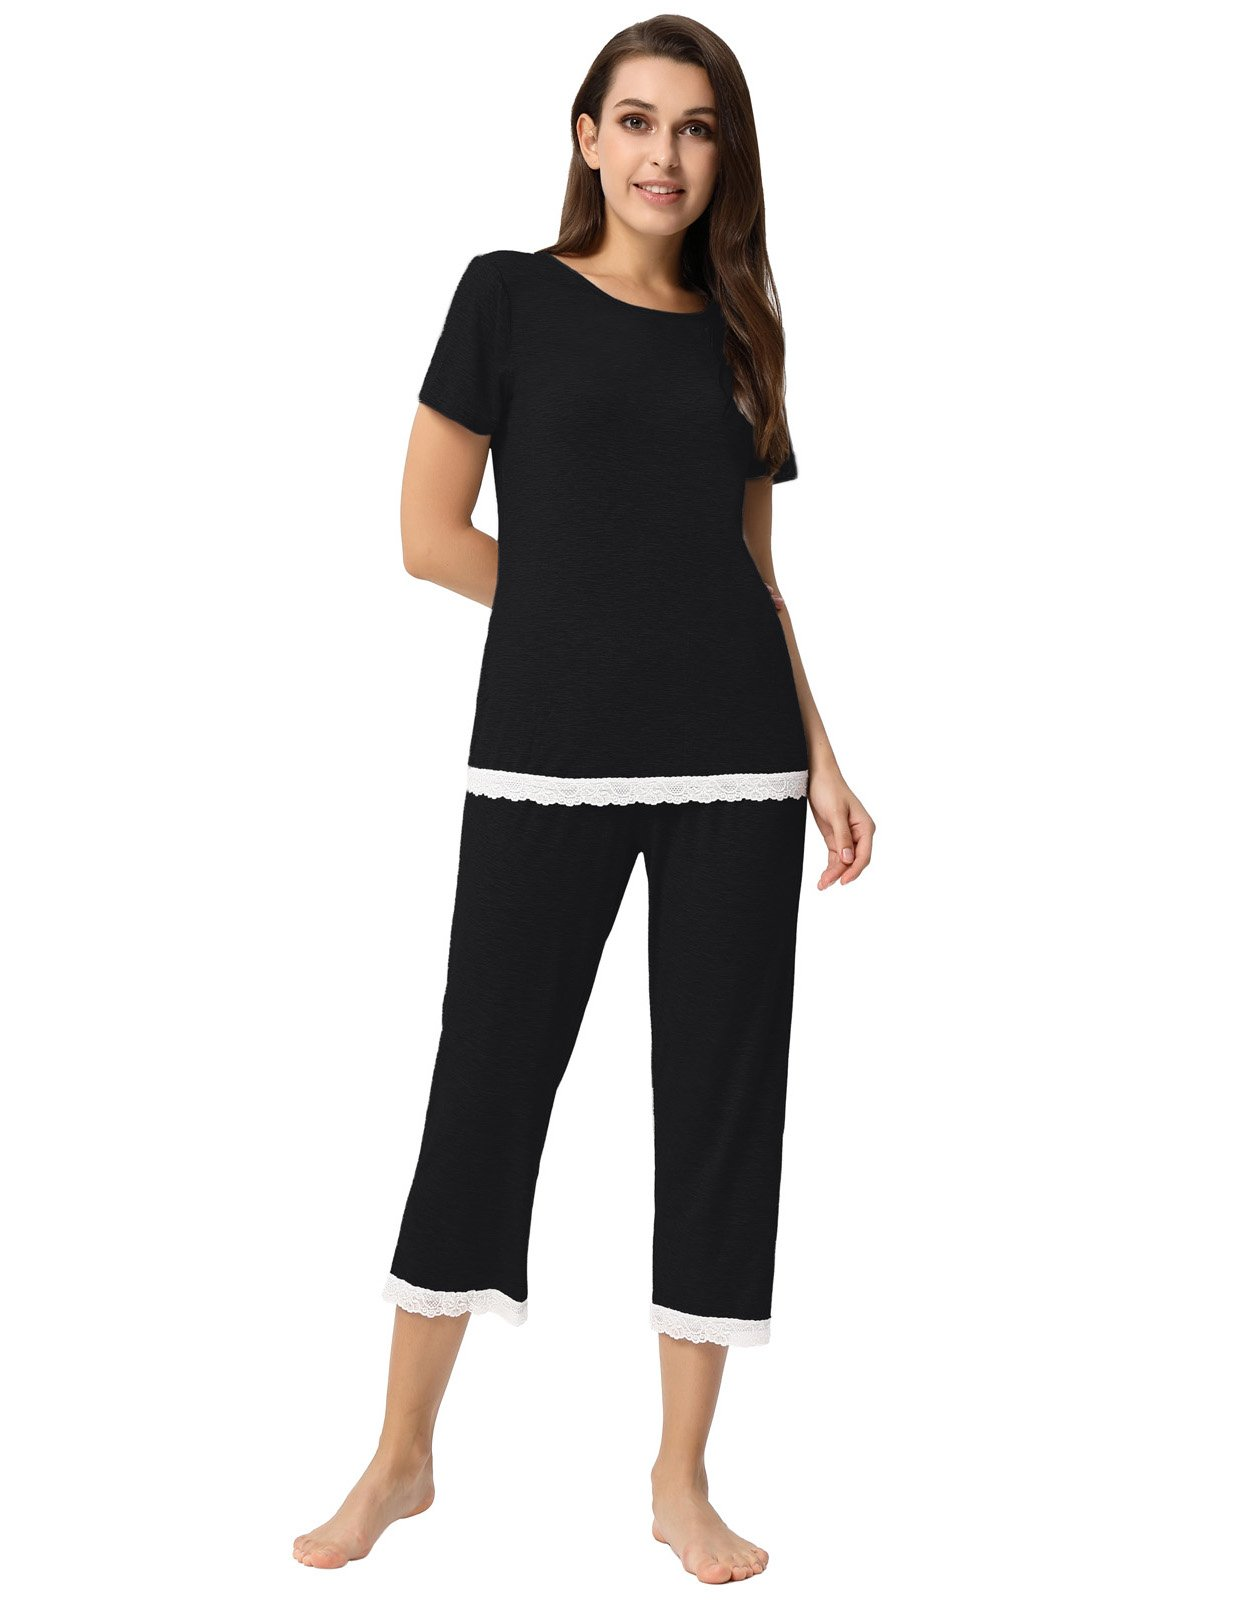 Women Pajama Short Set Solid Tops with Pants Cotton Nightwear Black Size L